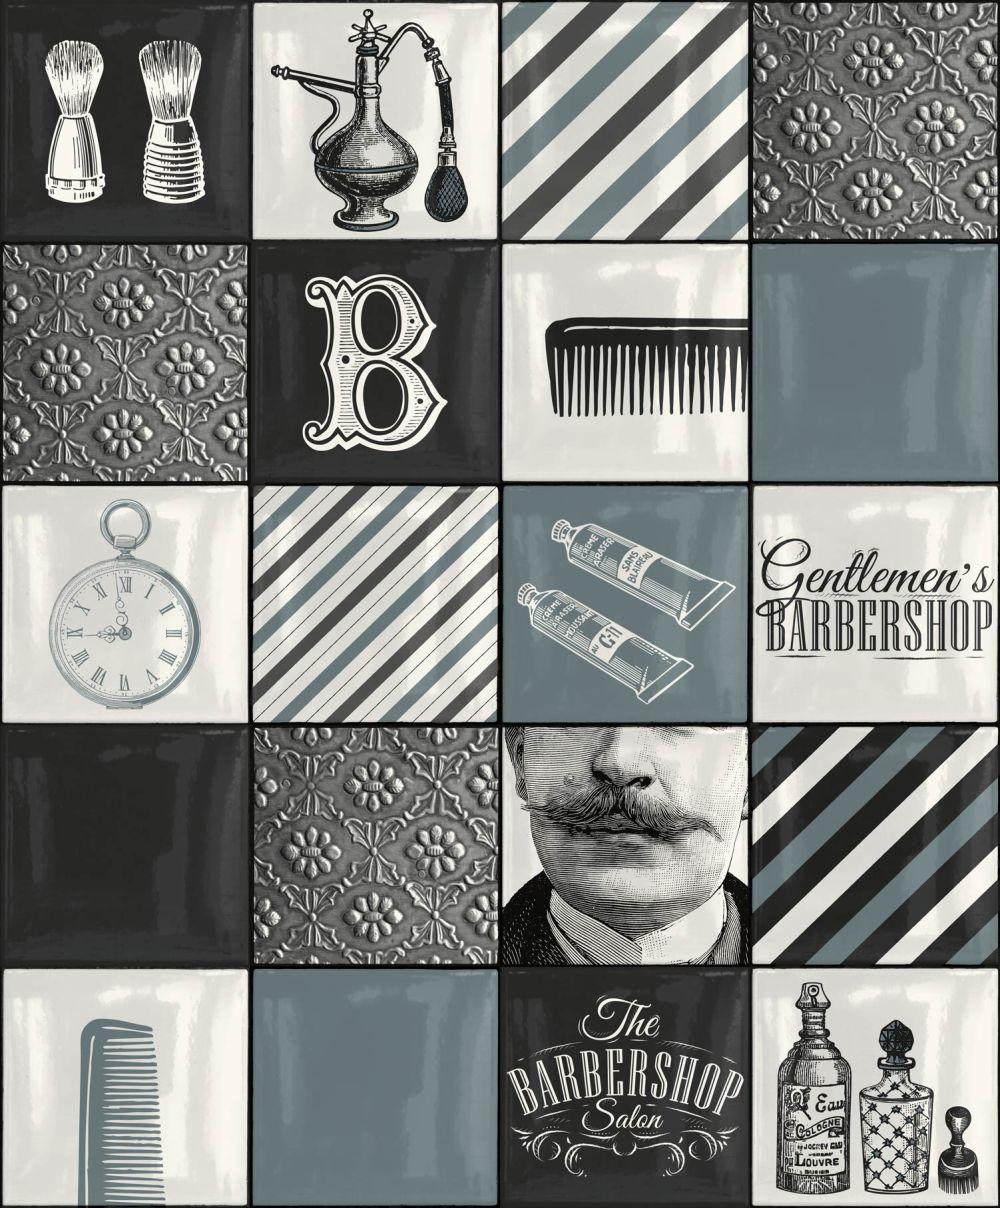 Barber Shop Tile By Albany Blue Wallpaper Wallpaper Direct Barber Shop White Wallpaper Barber Shop Interior